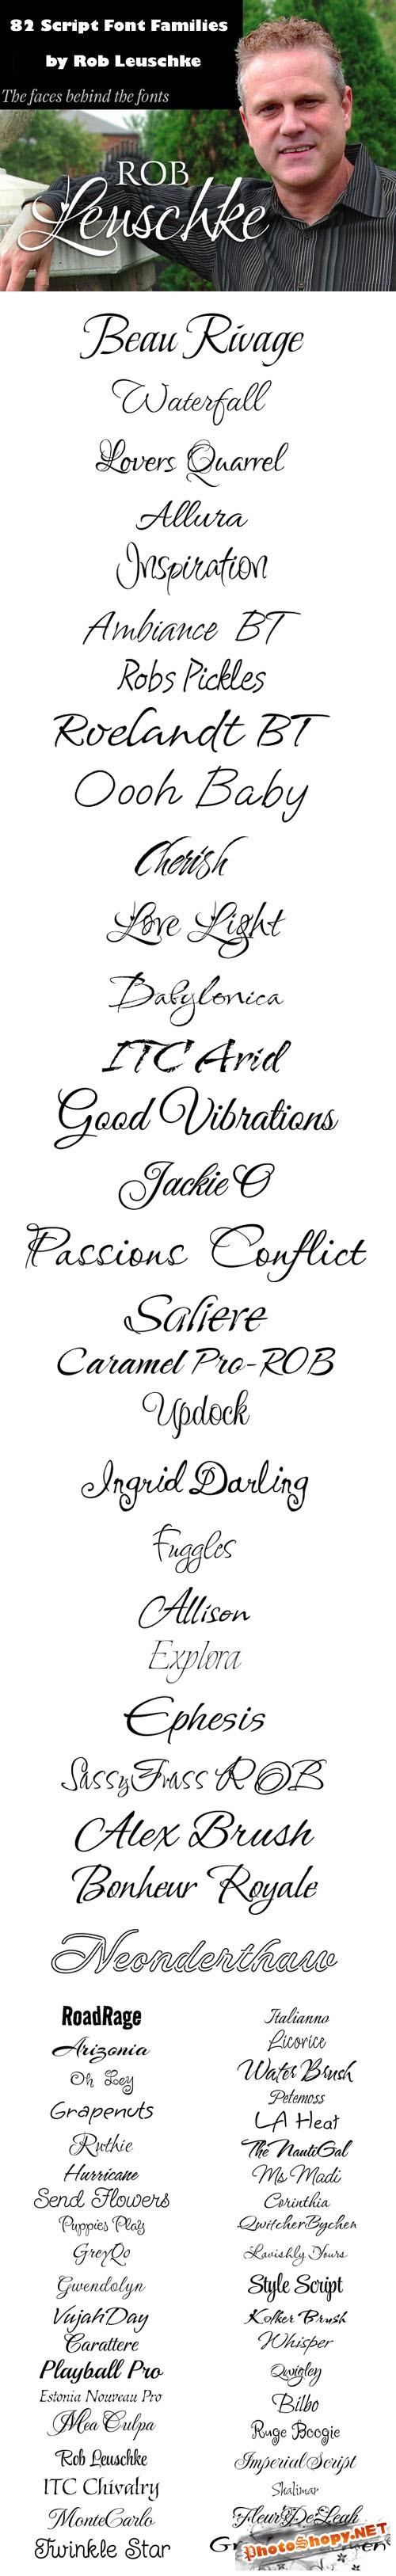 82 Script Font Families by Rob Leuschke